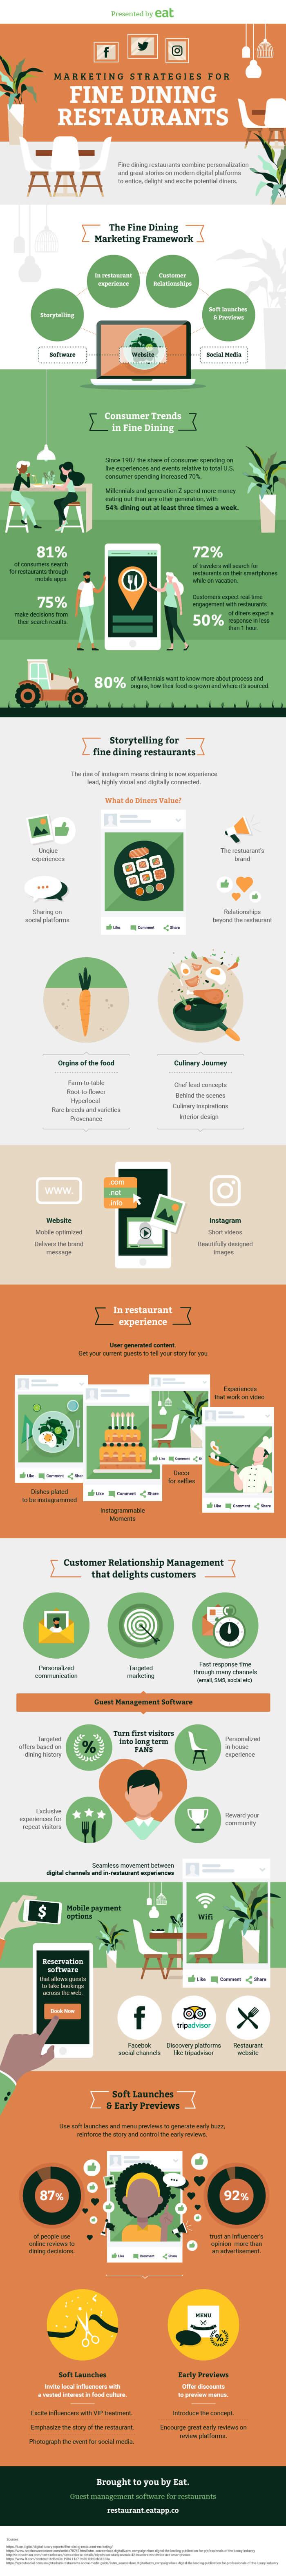 Fine Dining Restaurant Marketing Infographic